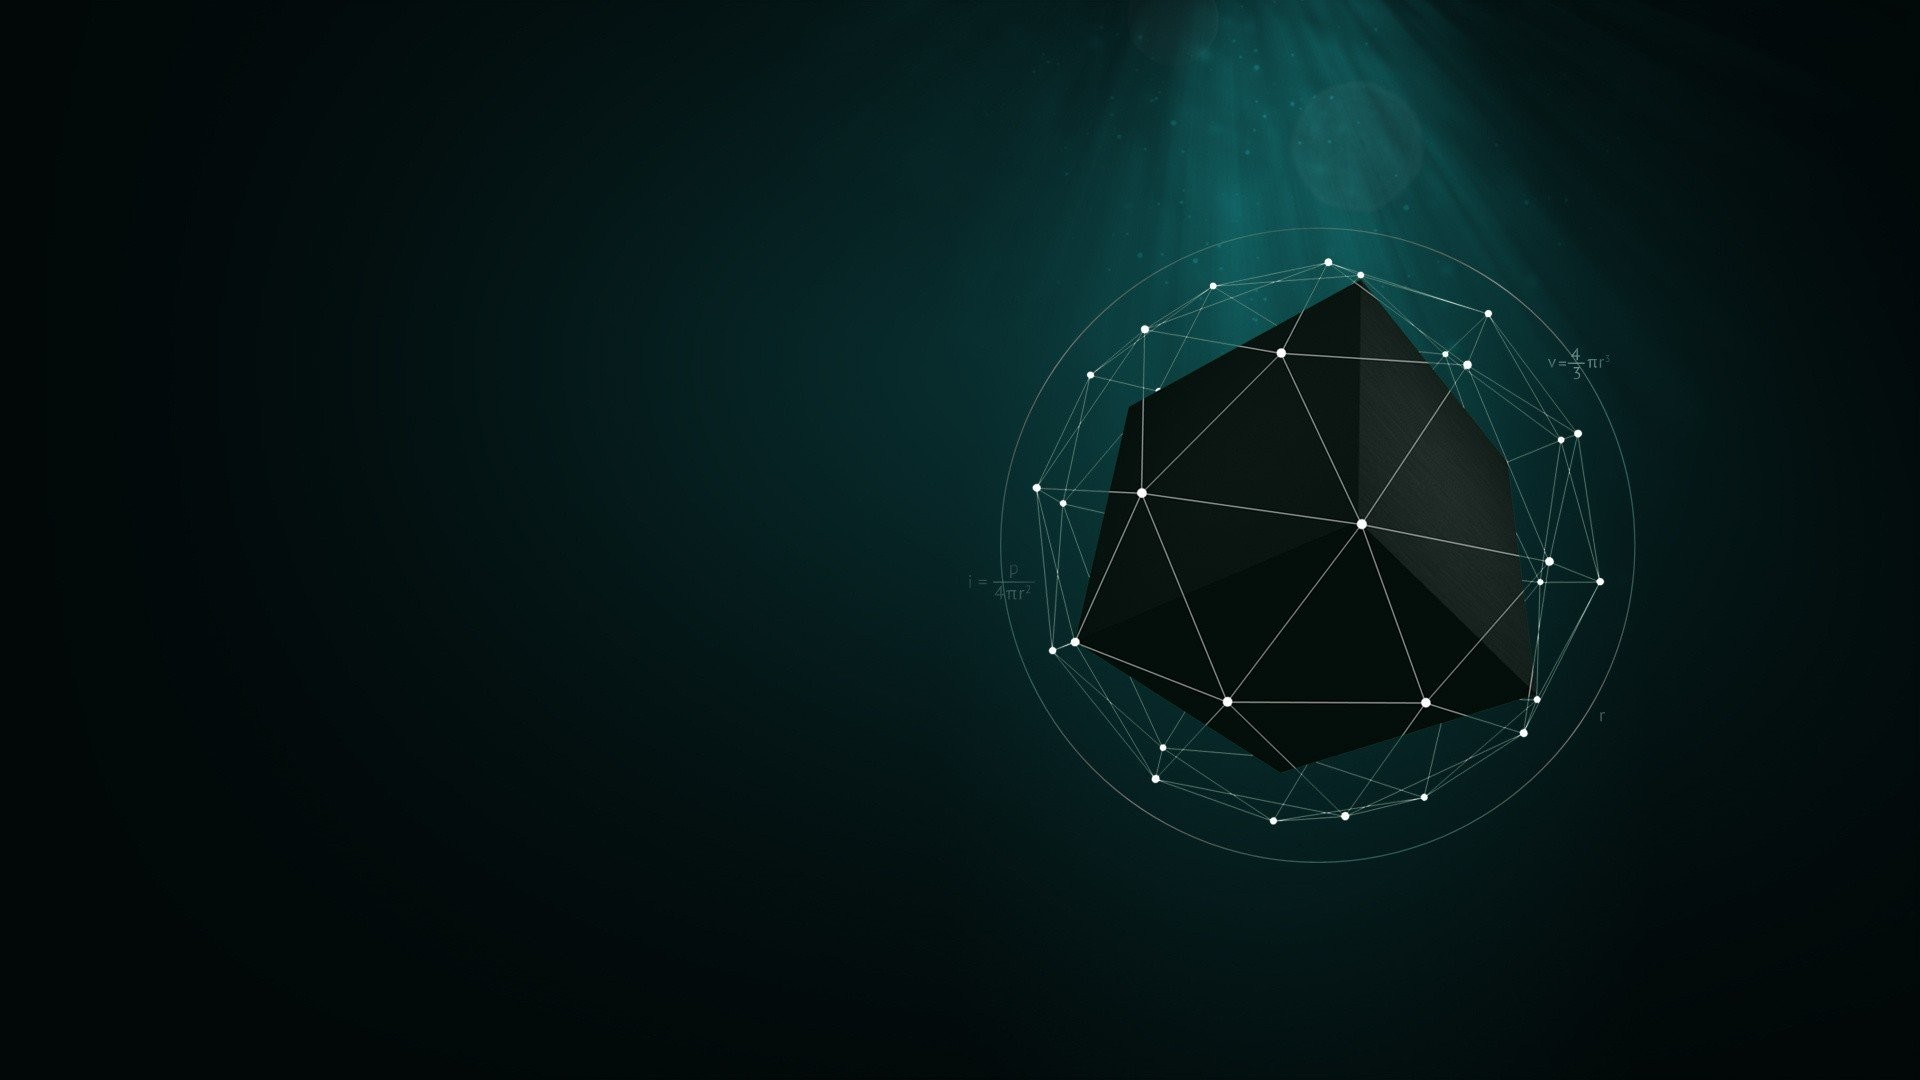 … download minimalist wallpapers free pixelstalk net …